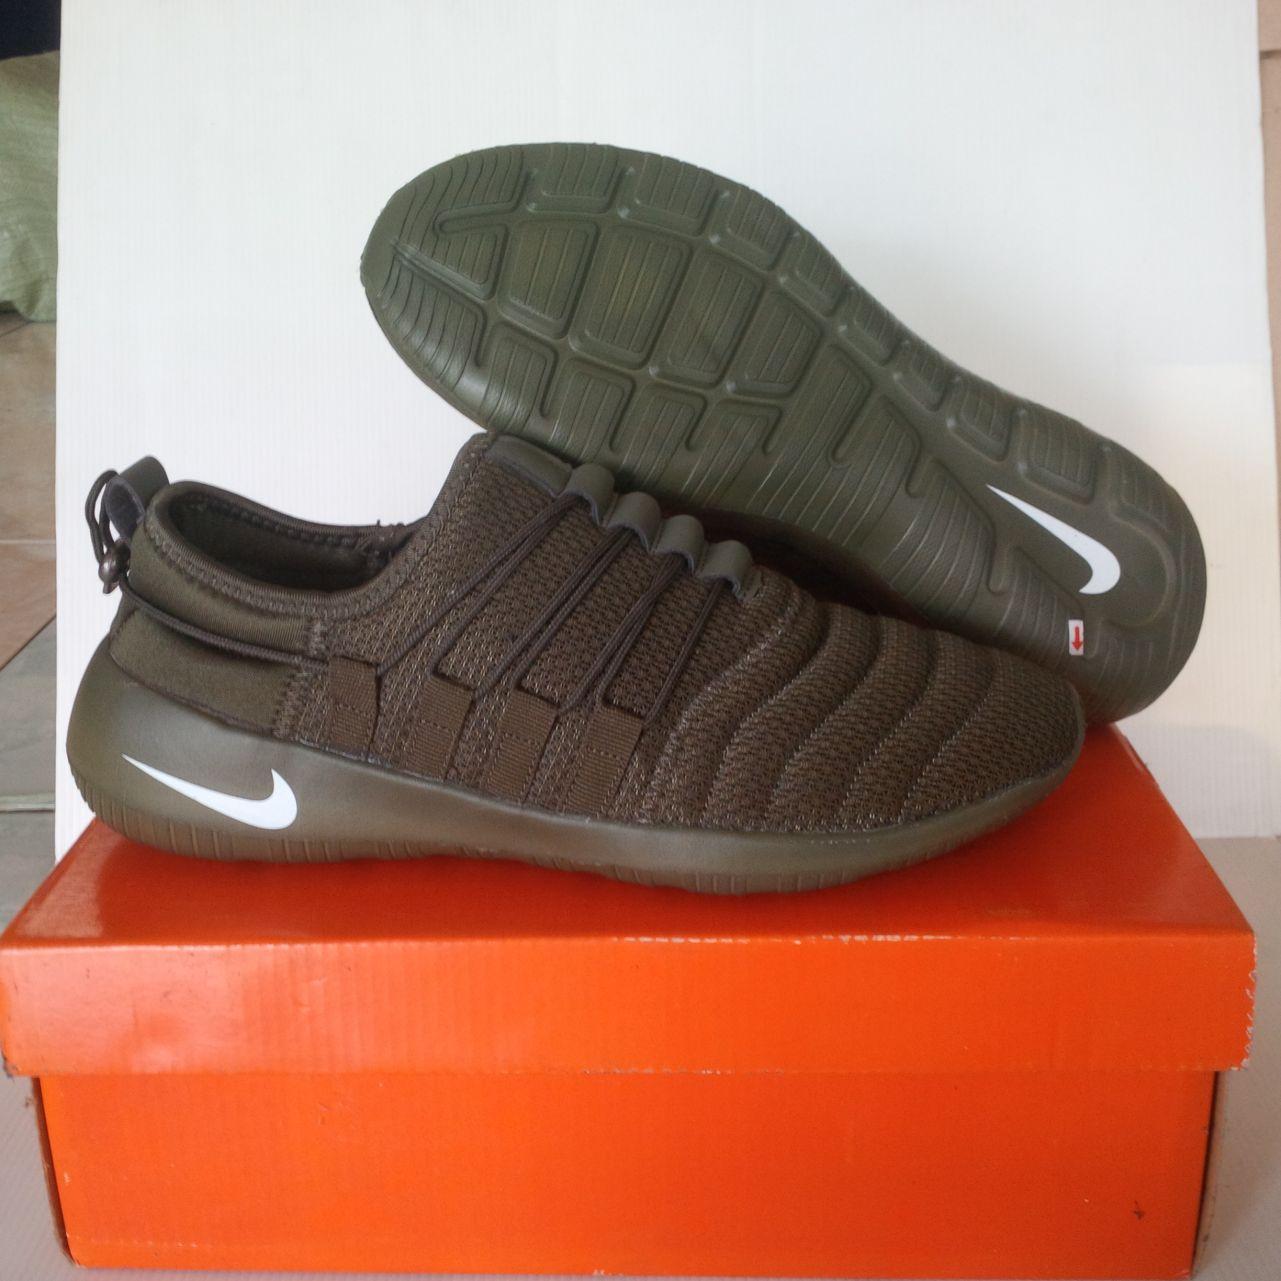 sepatu pria nikelap payaa running olahraga dan gaul premium NK4